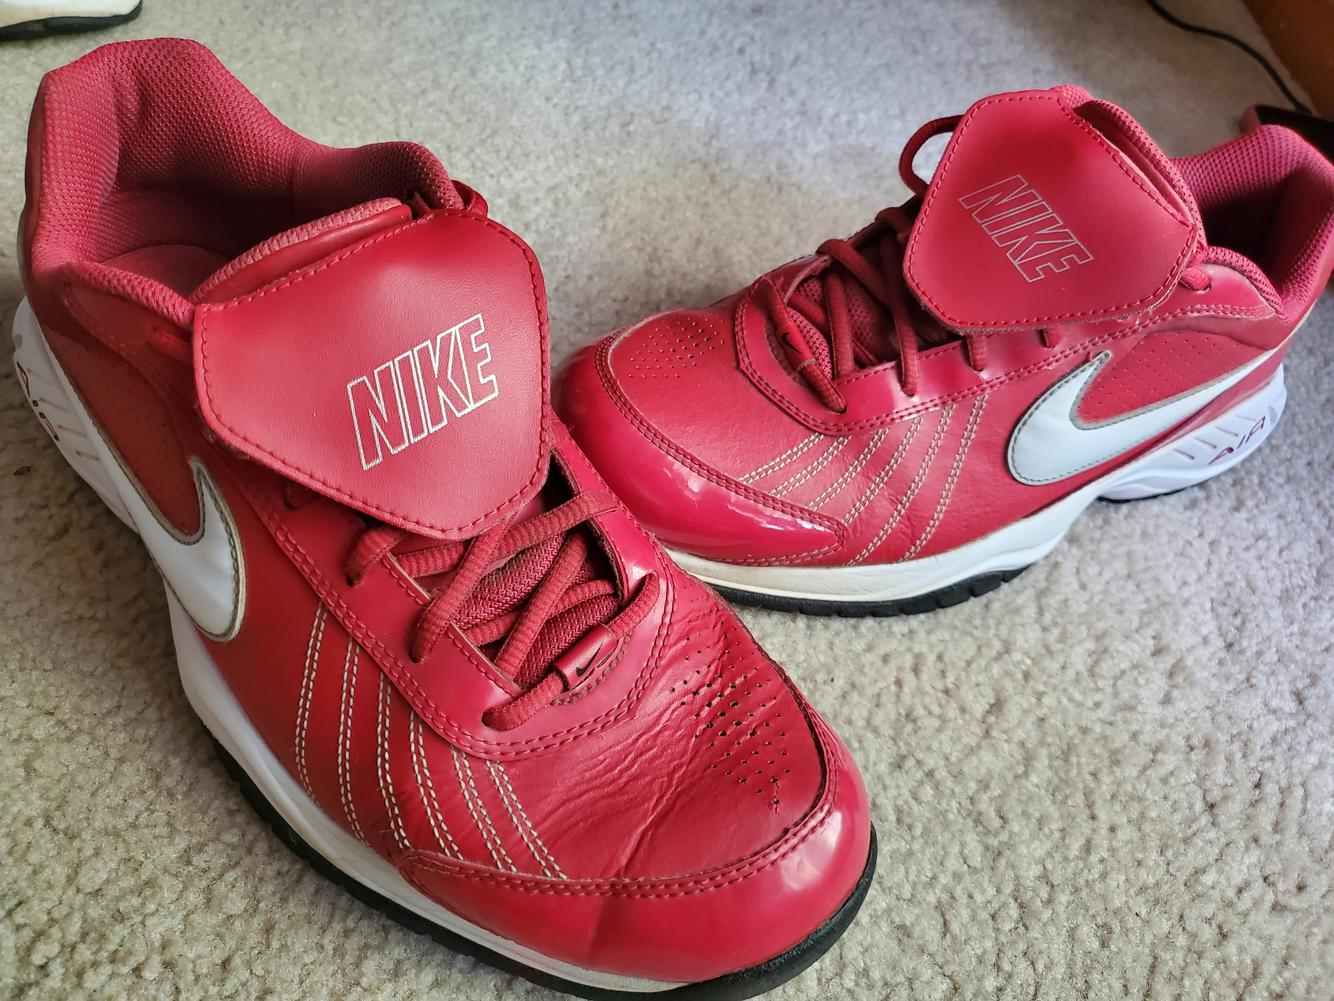 Nike turf coaches shoes red sz 11